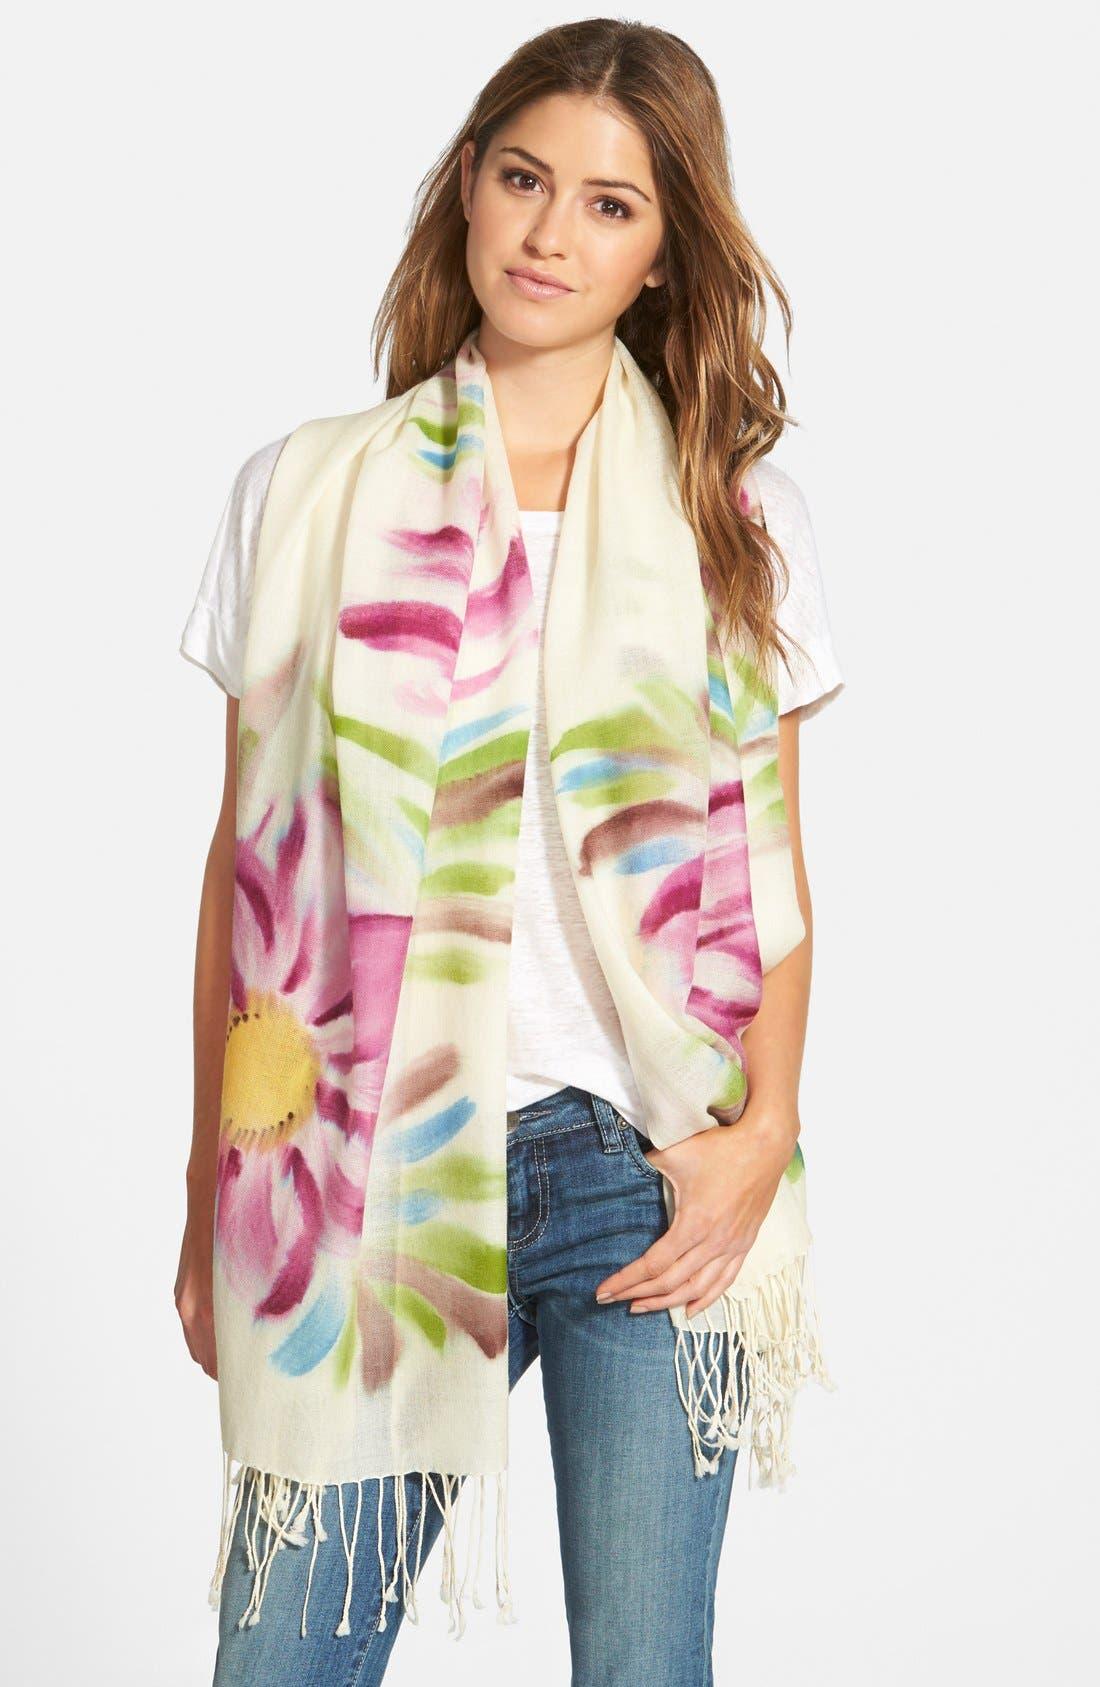 LA FIORENTINA Floral Wool Scarf